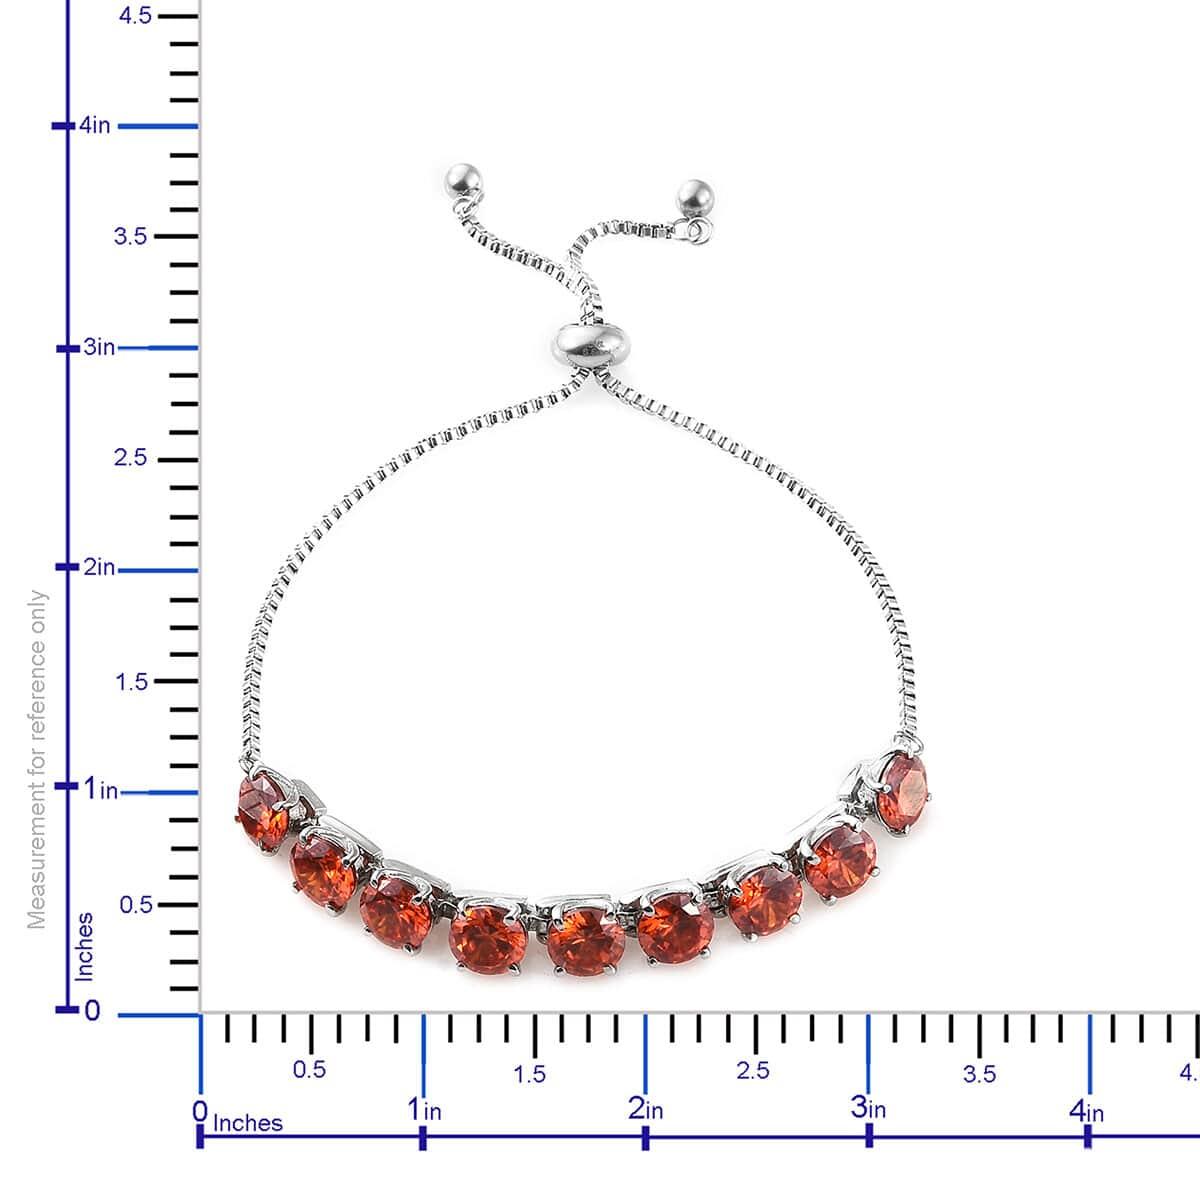 Steel-Cubic-Zirconia-CZ-Orange-Elegant-Adjustable-Bolo-Bracelet-for-Women-Ct-21 thumbnail 11